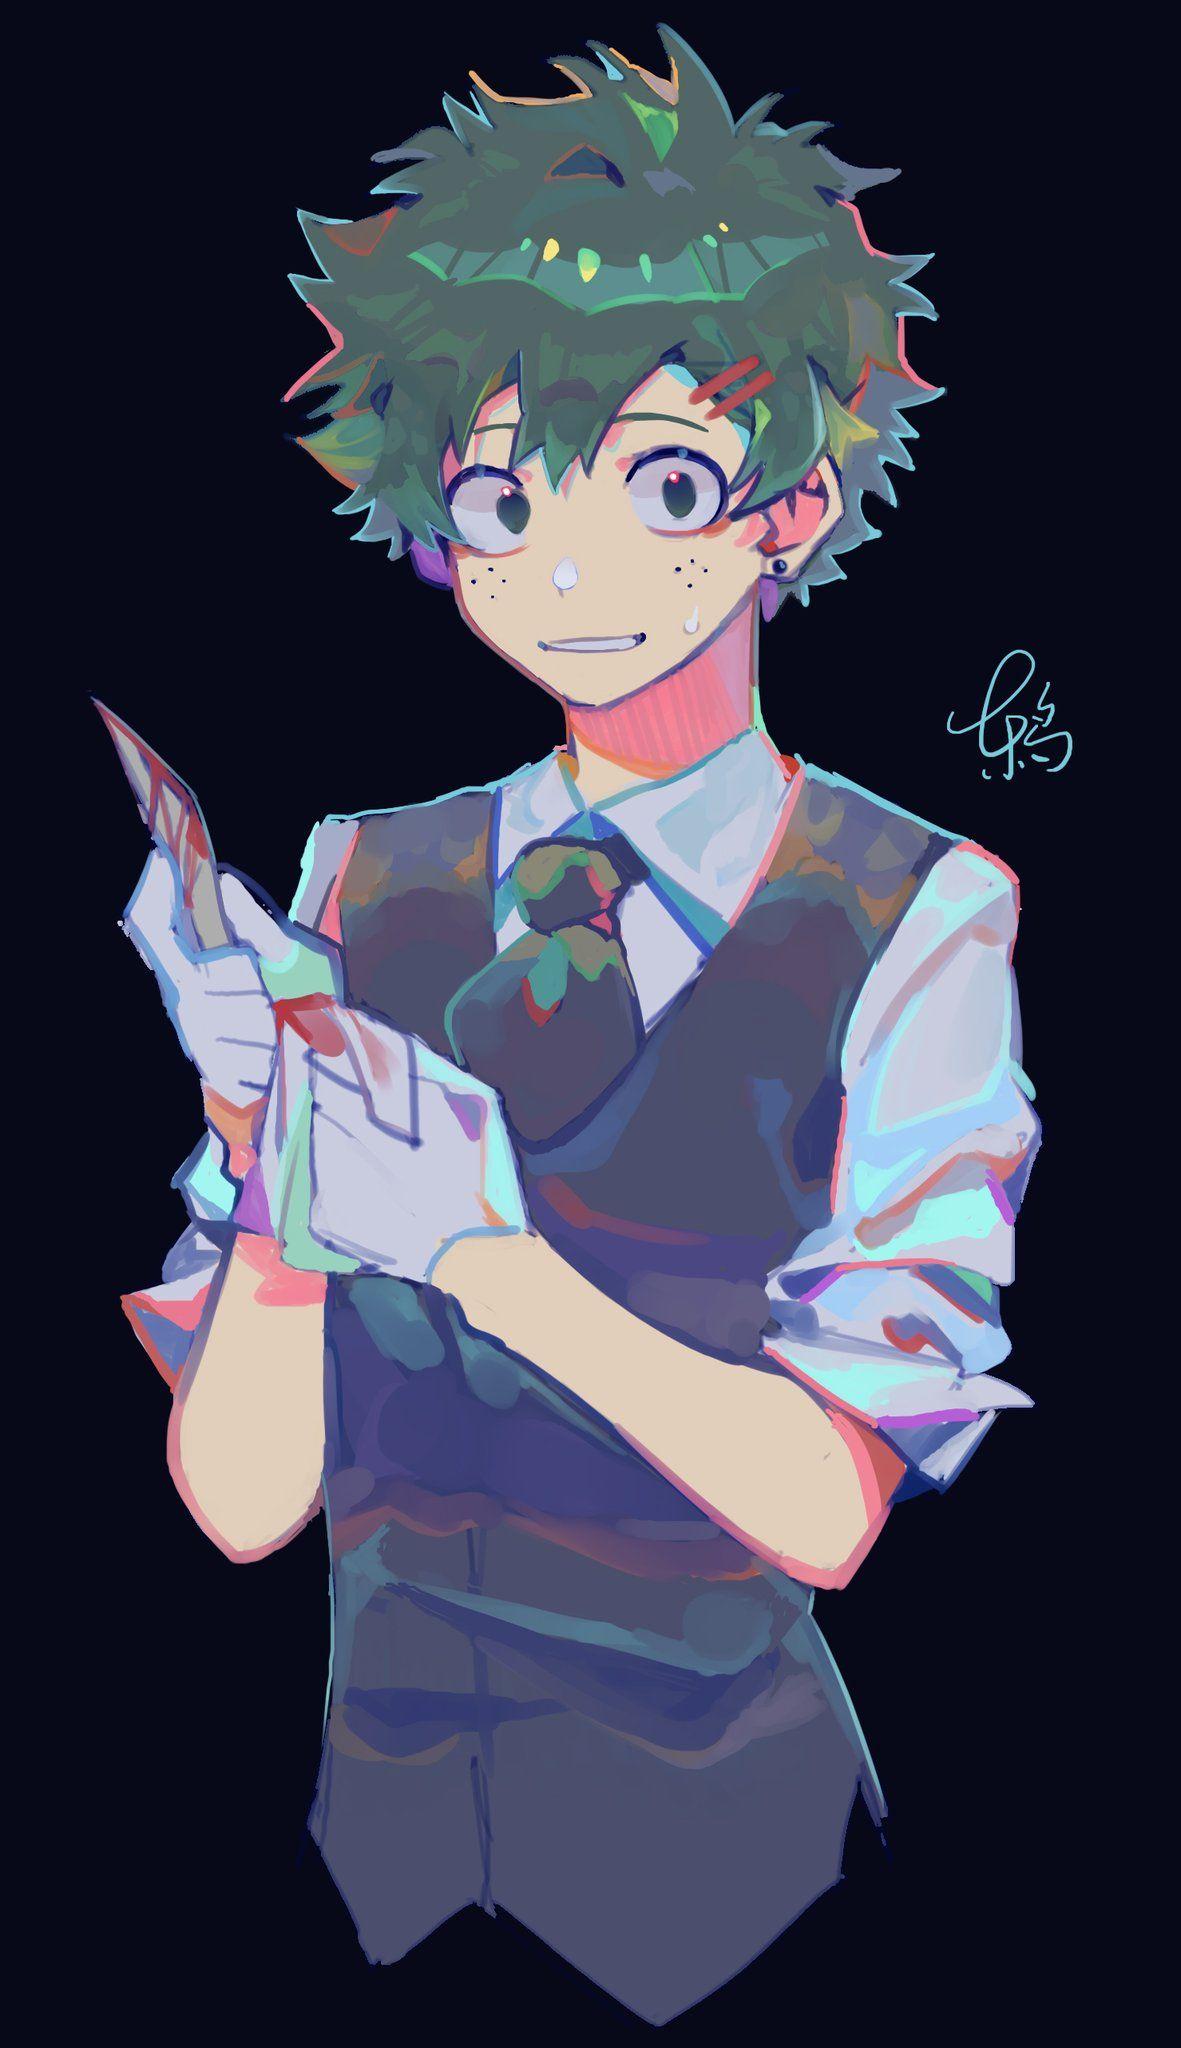 Anime My Hero Academia Anime Fanart Animeboy Art Artwork Manga Villain Deku Anime Hero Wallpaper